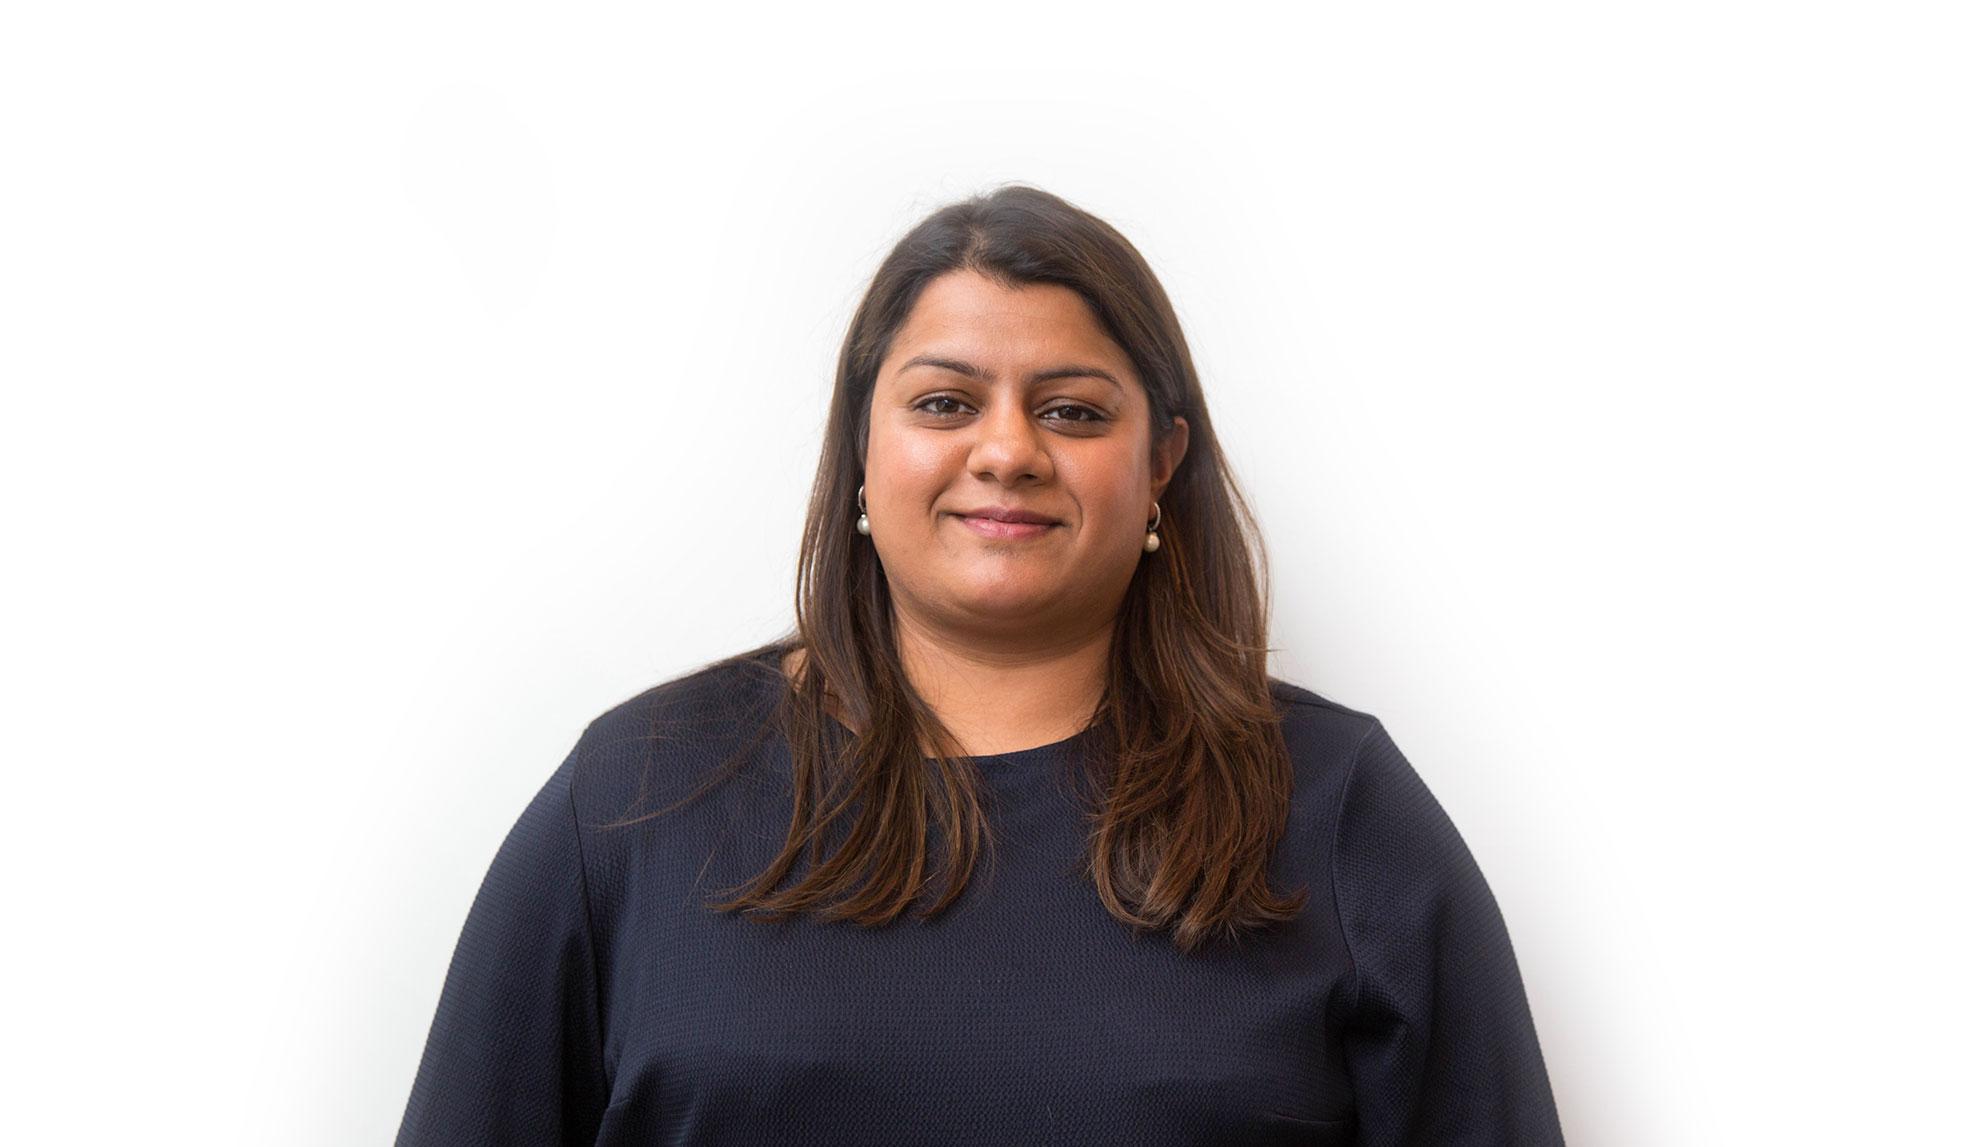 Swetha Patel